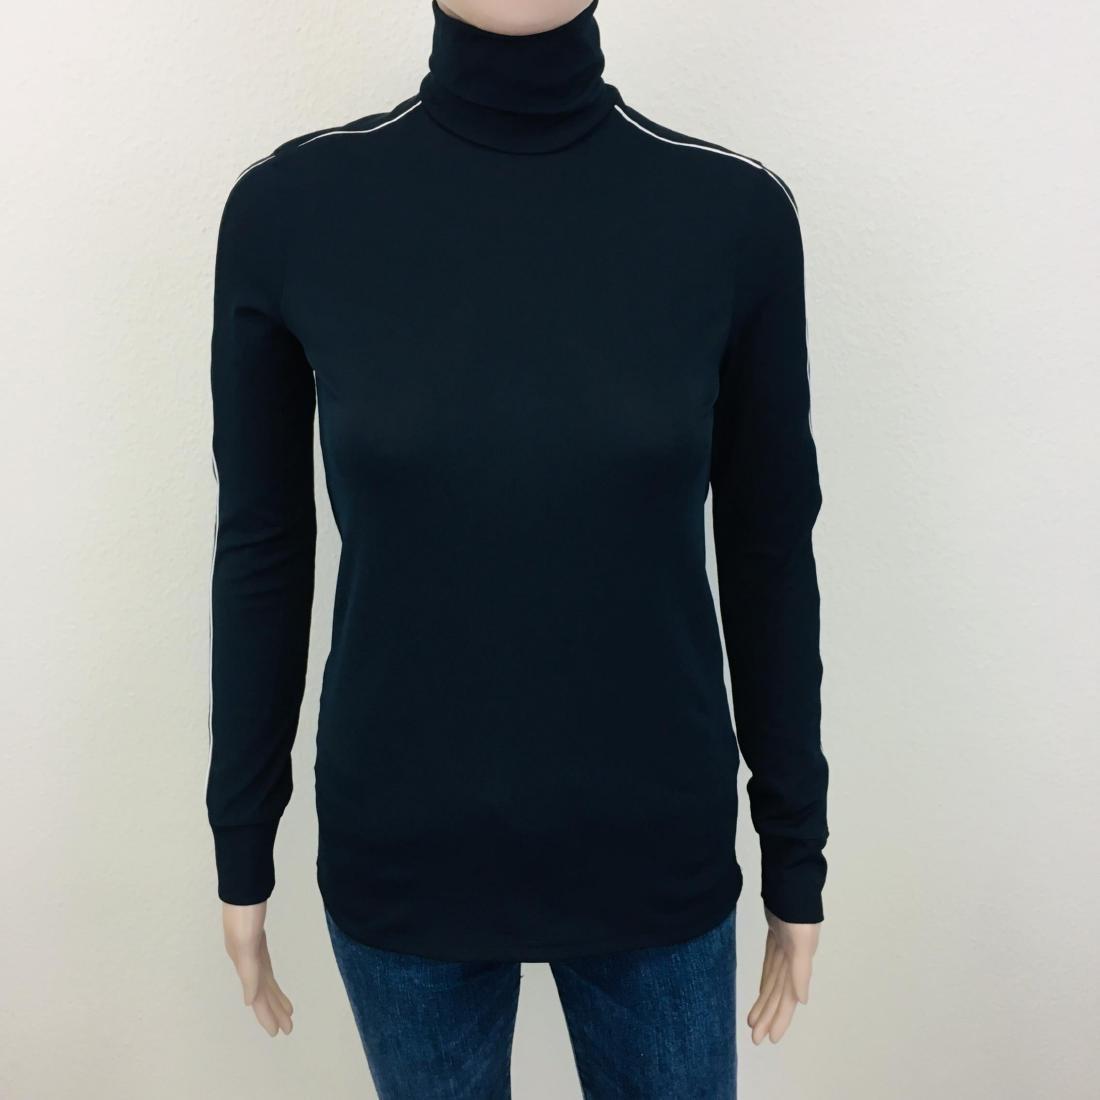 New Women's ZARA Turtleneck Sweater Size M - 4